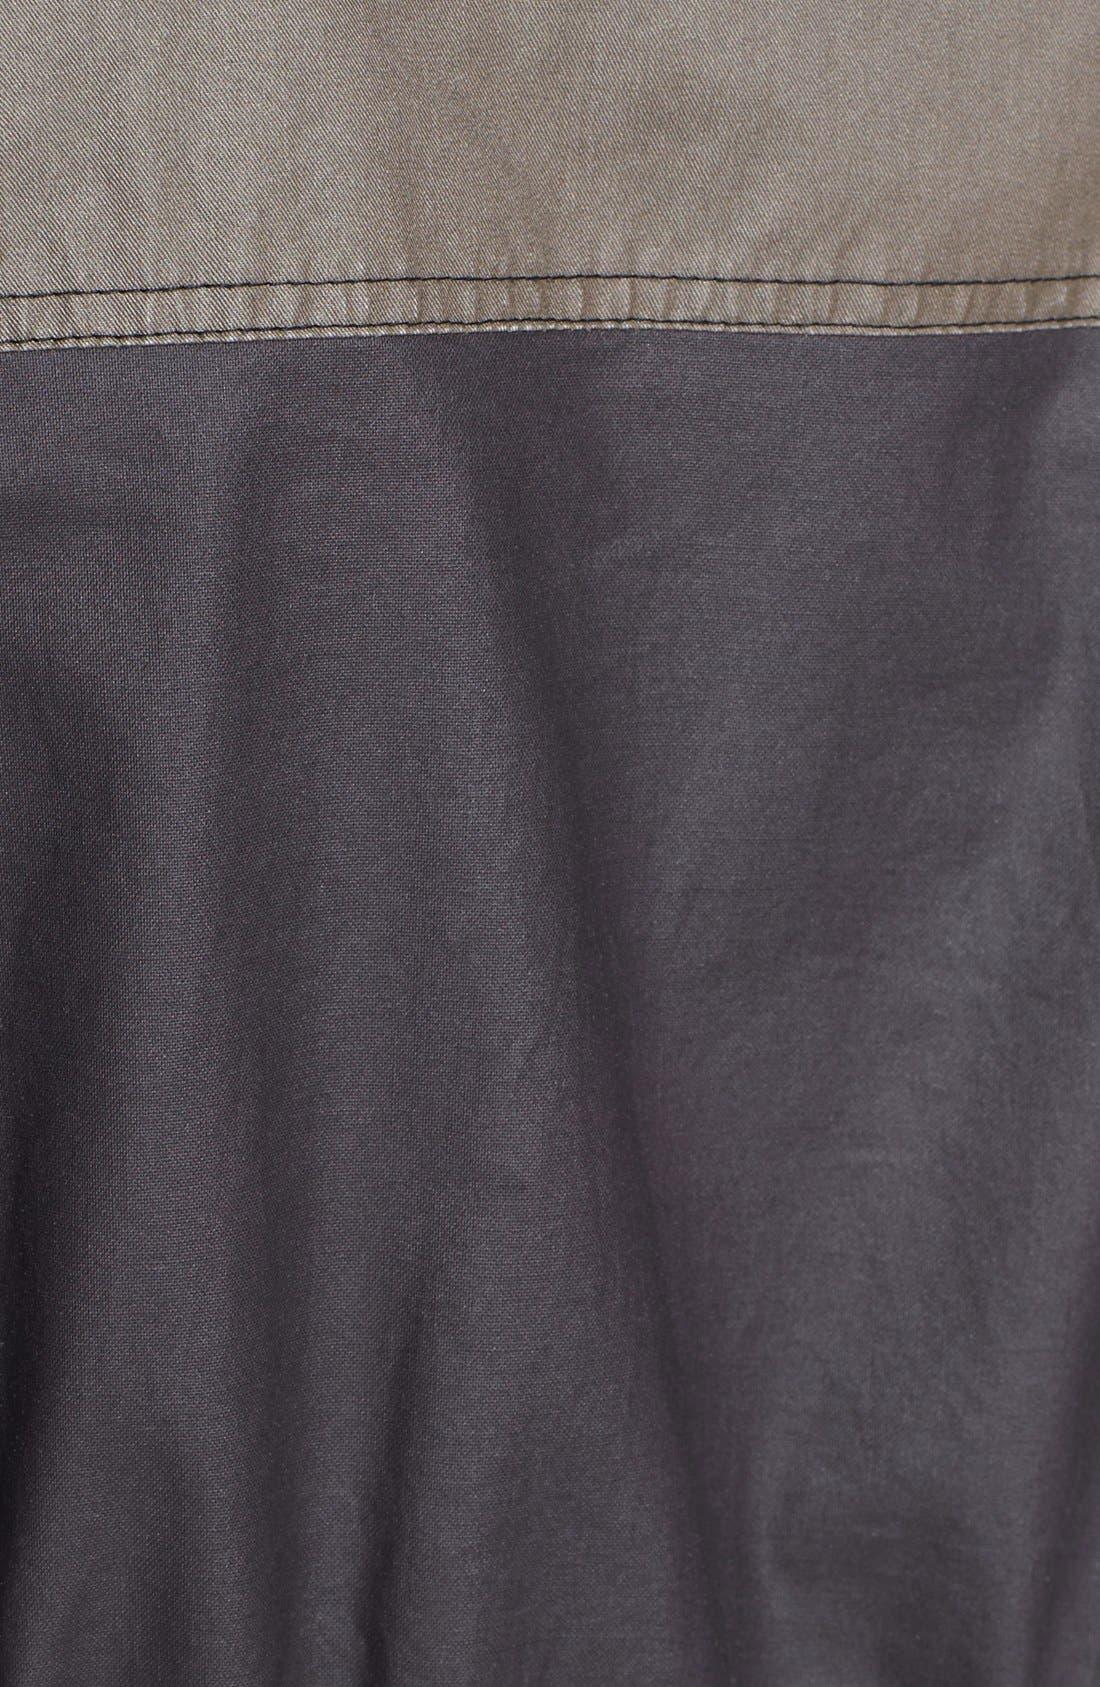 Waxed Cotton Field Jacket,                             Alternate thumbnail 3, color,                             310